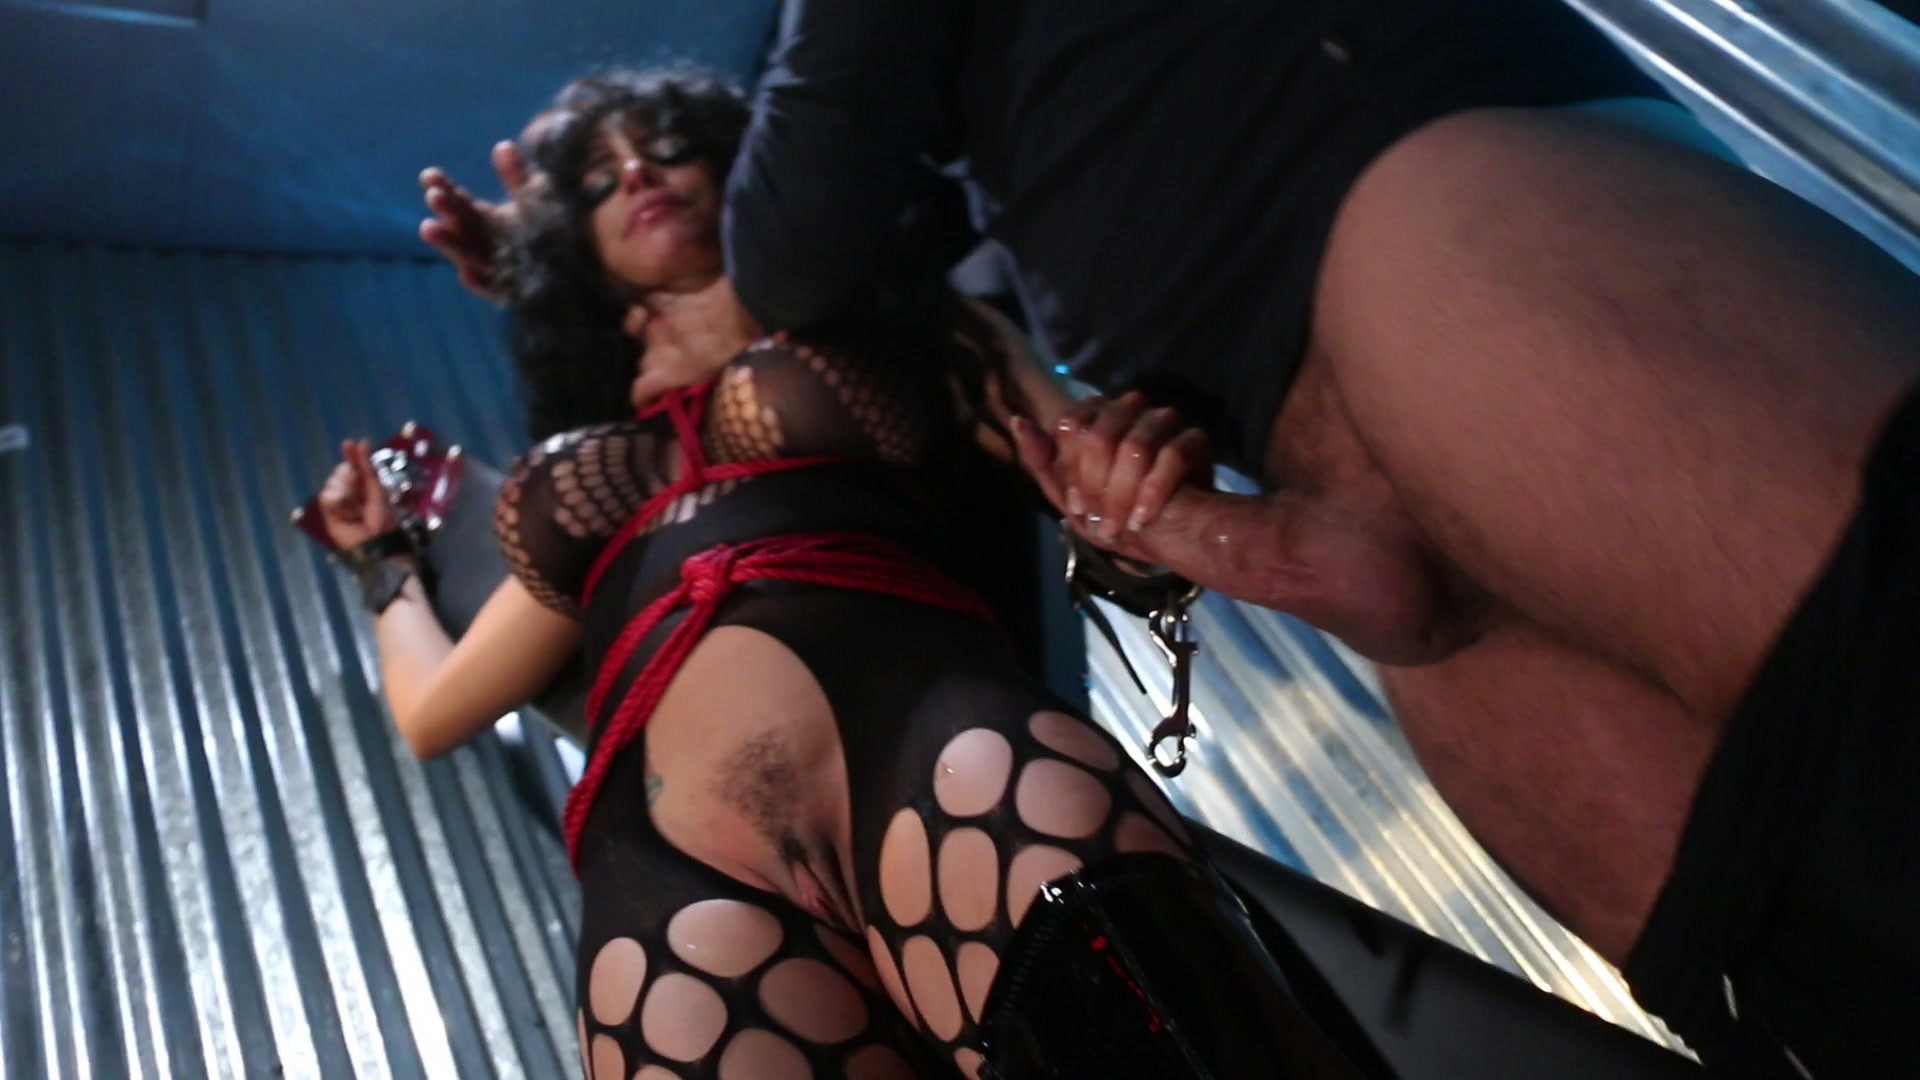 bdsm videos erotik shops